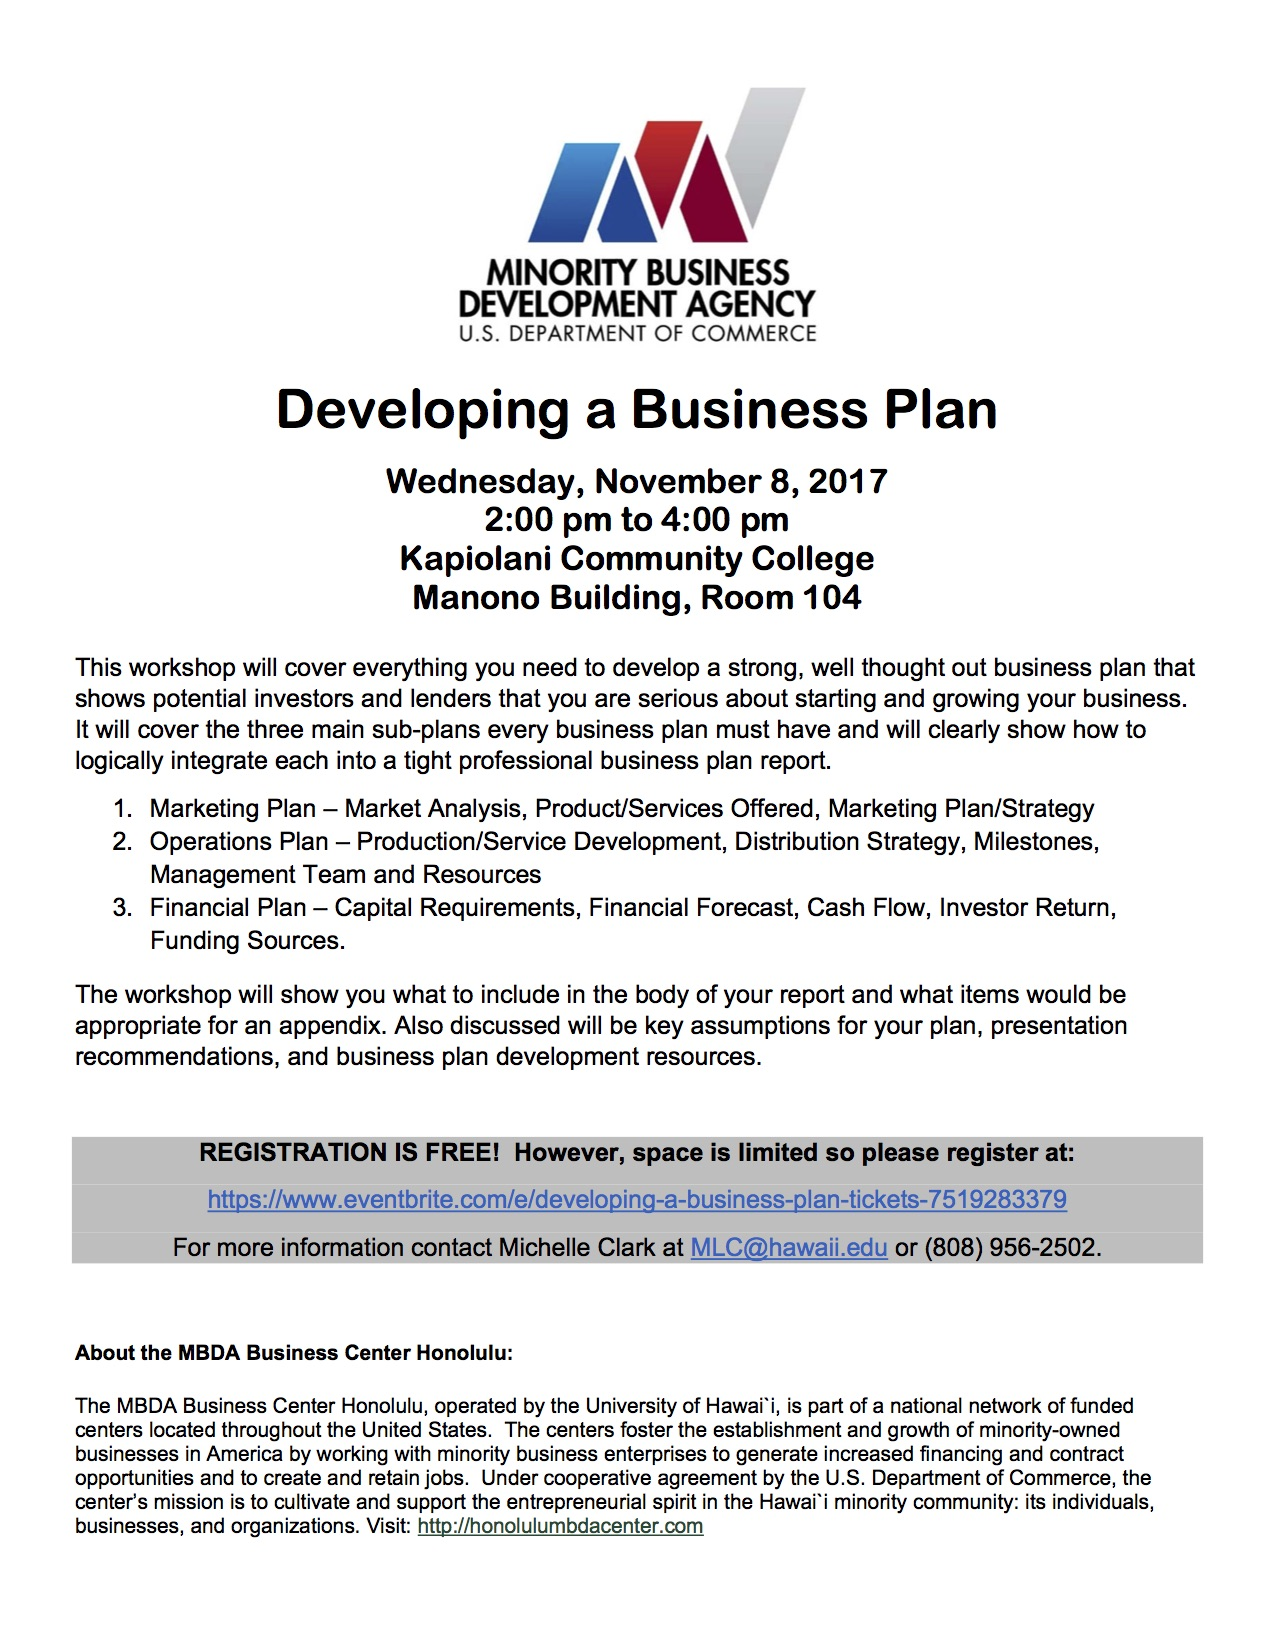 Developing a Business Plan Workshop.jpg